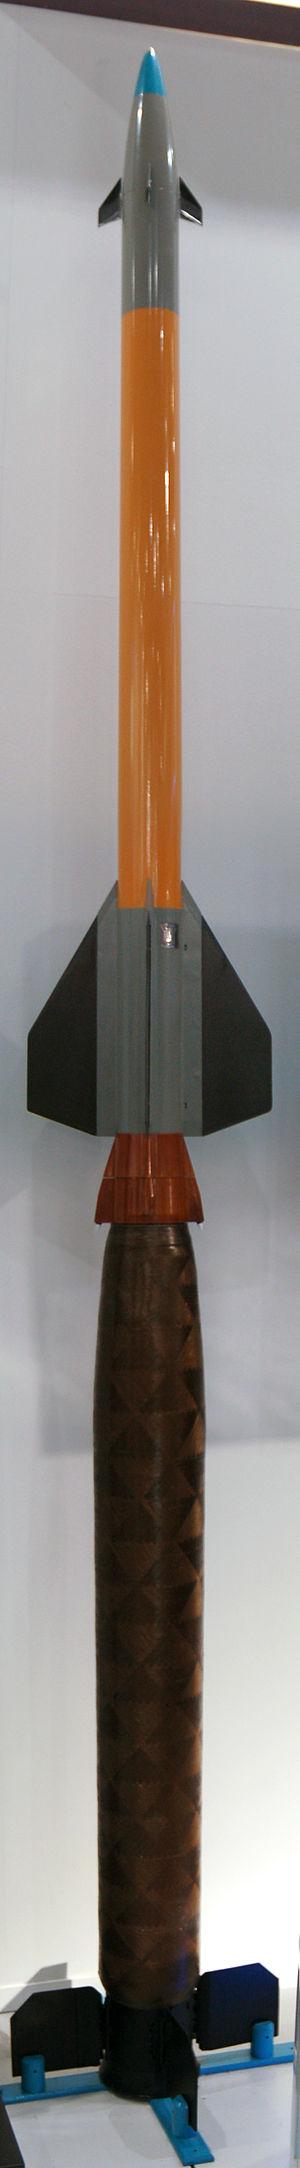 Pantsir-S1 - Image: Pantsir S1 missile maks 2009